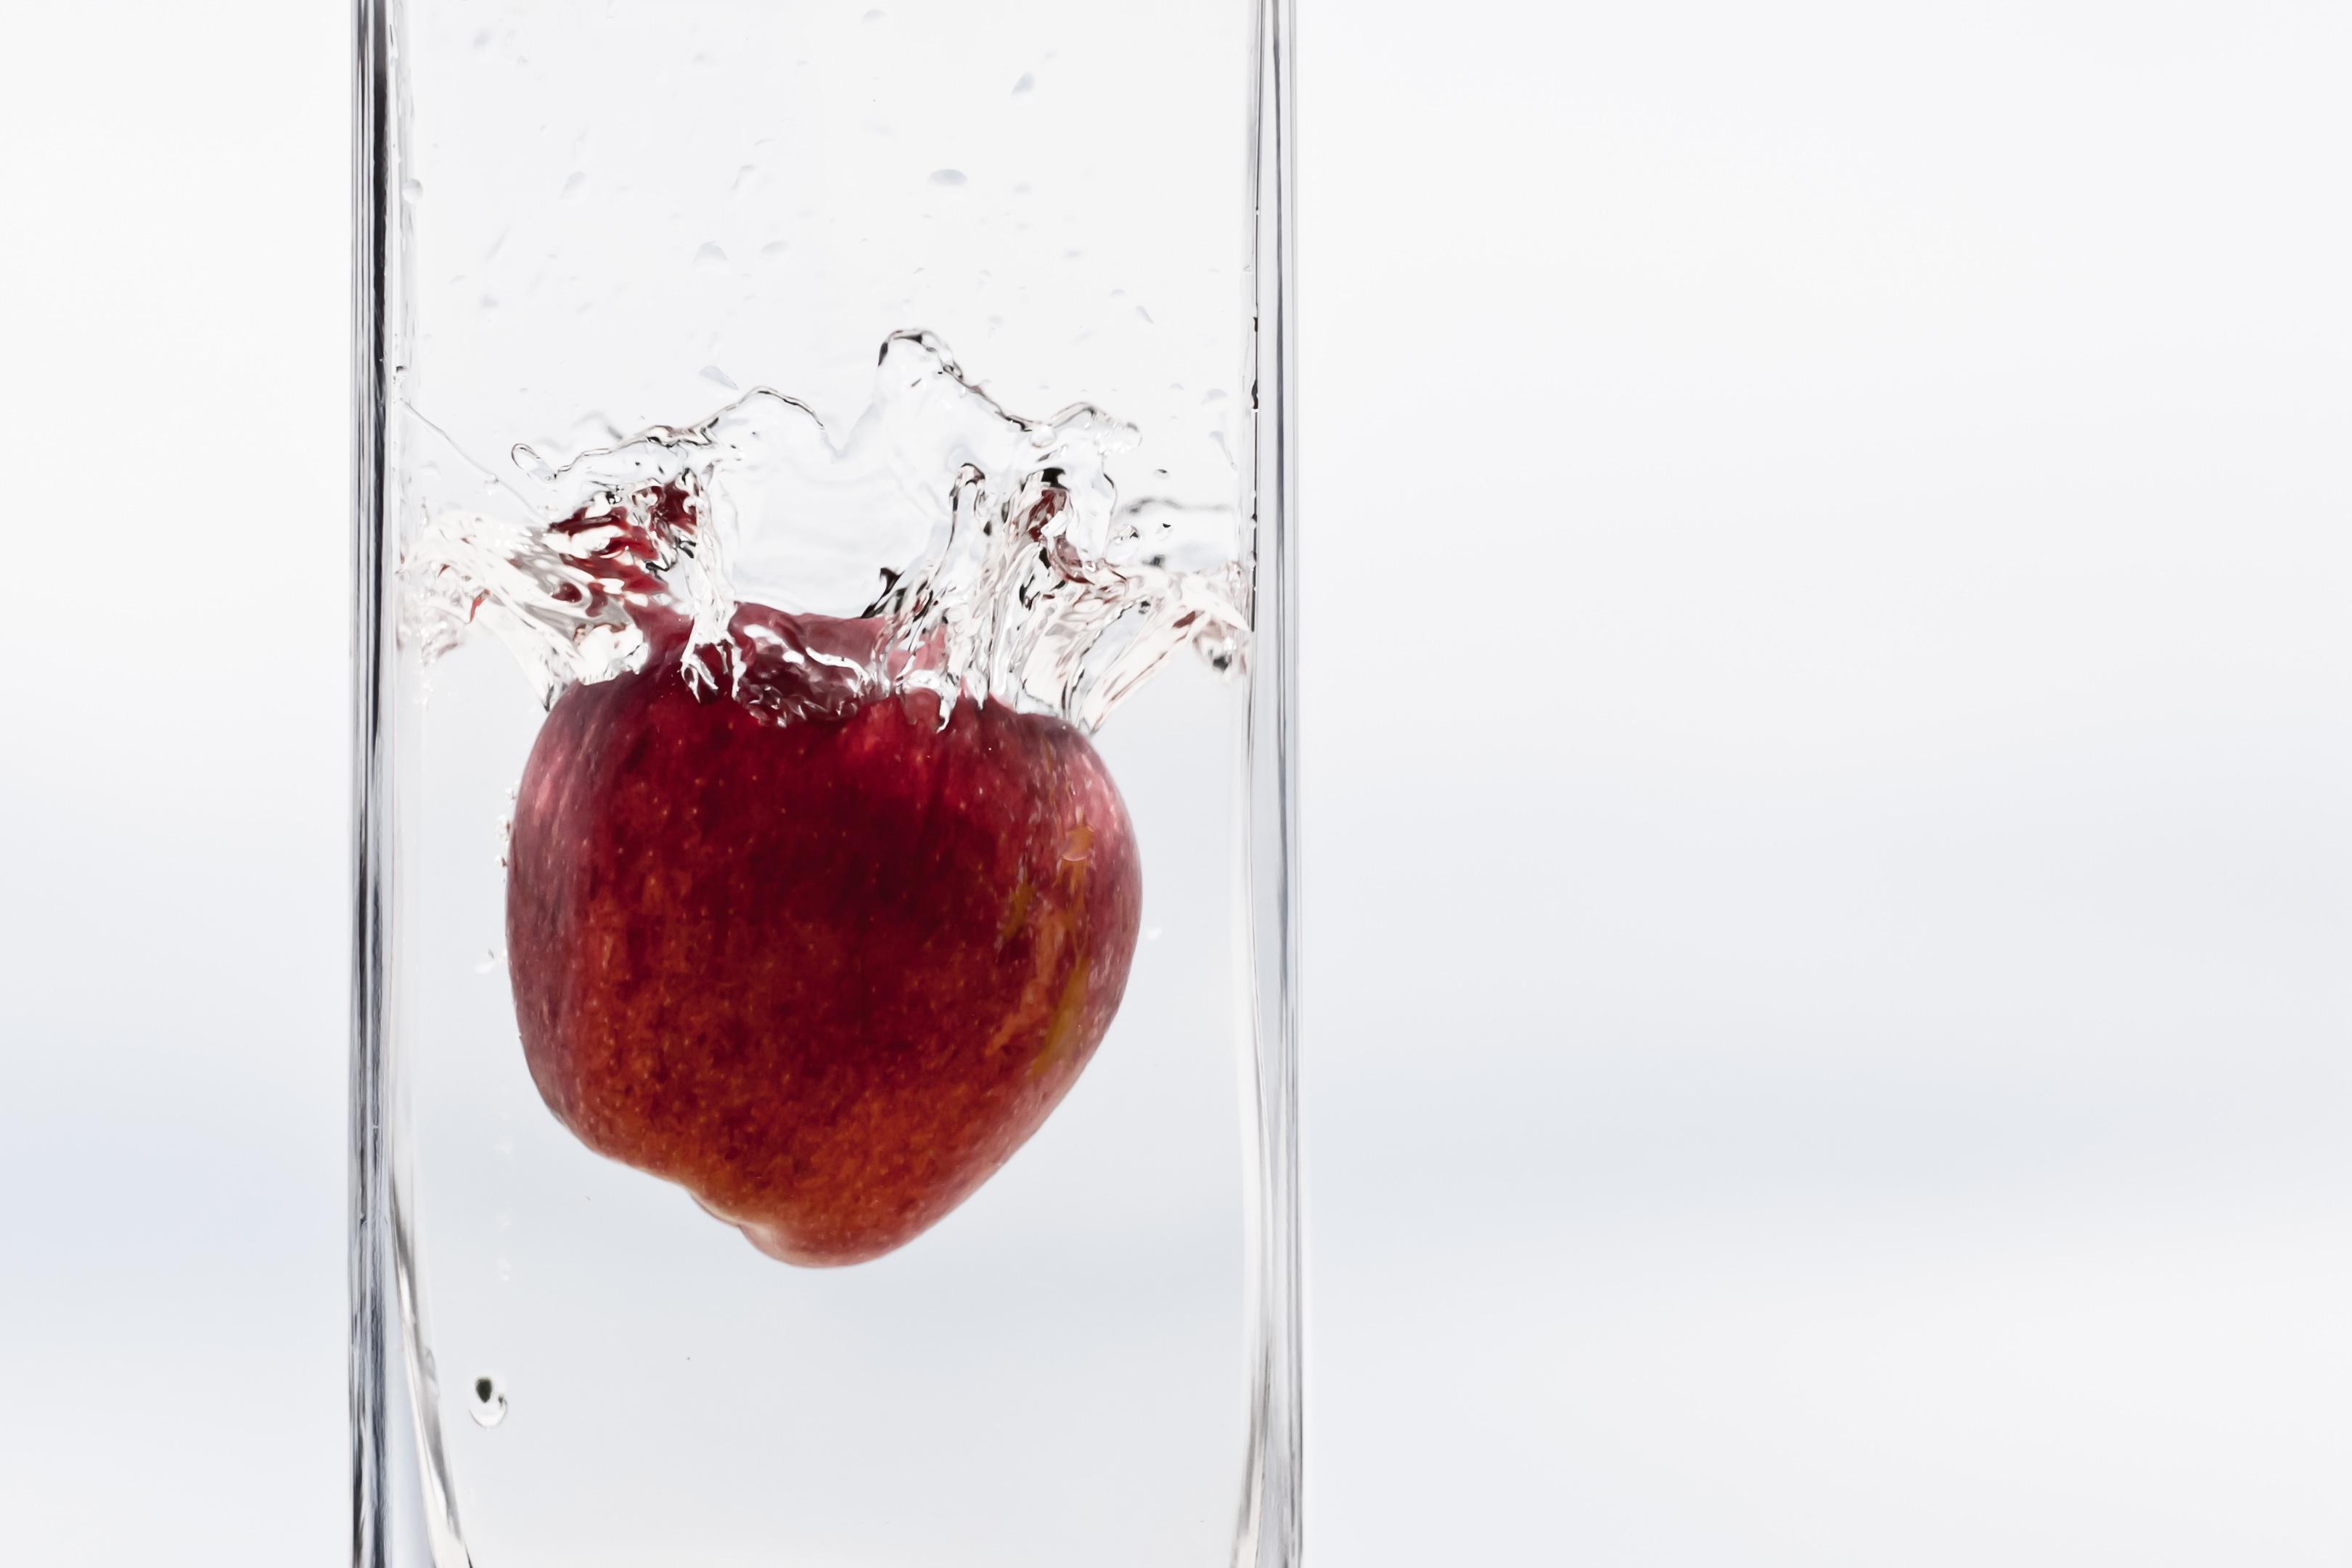 Apple, photo by Andrew Barron